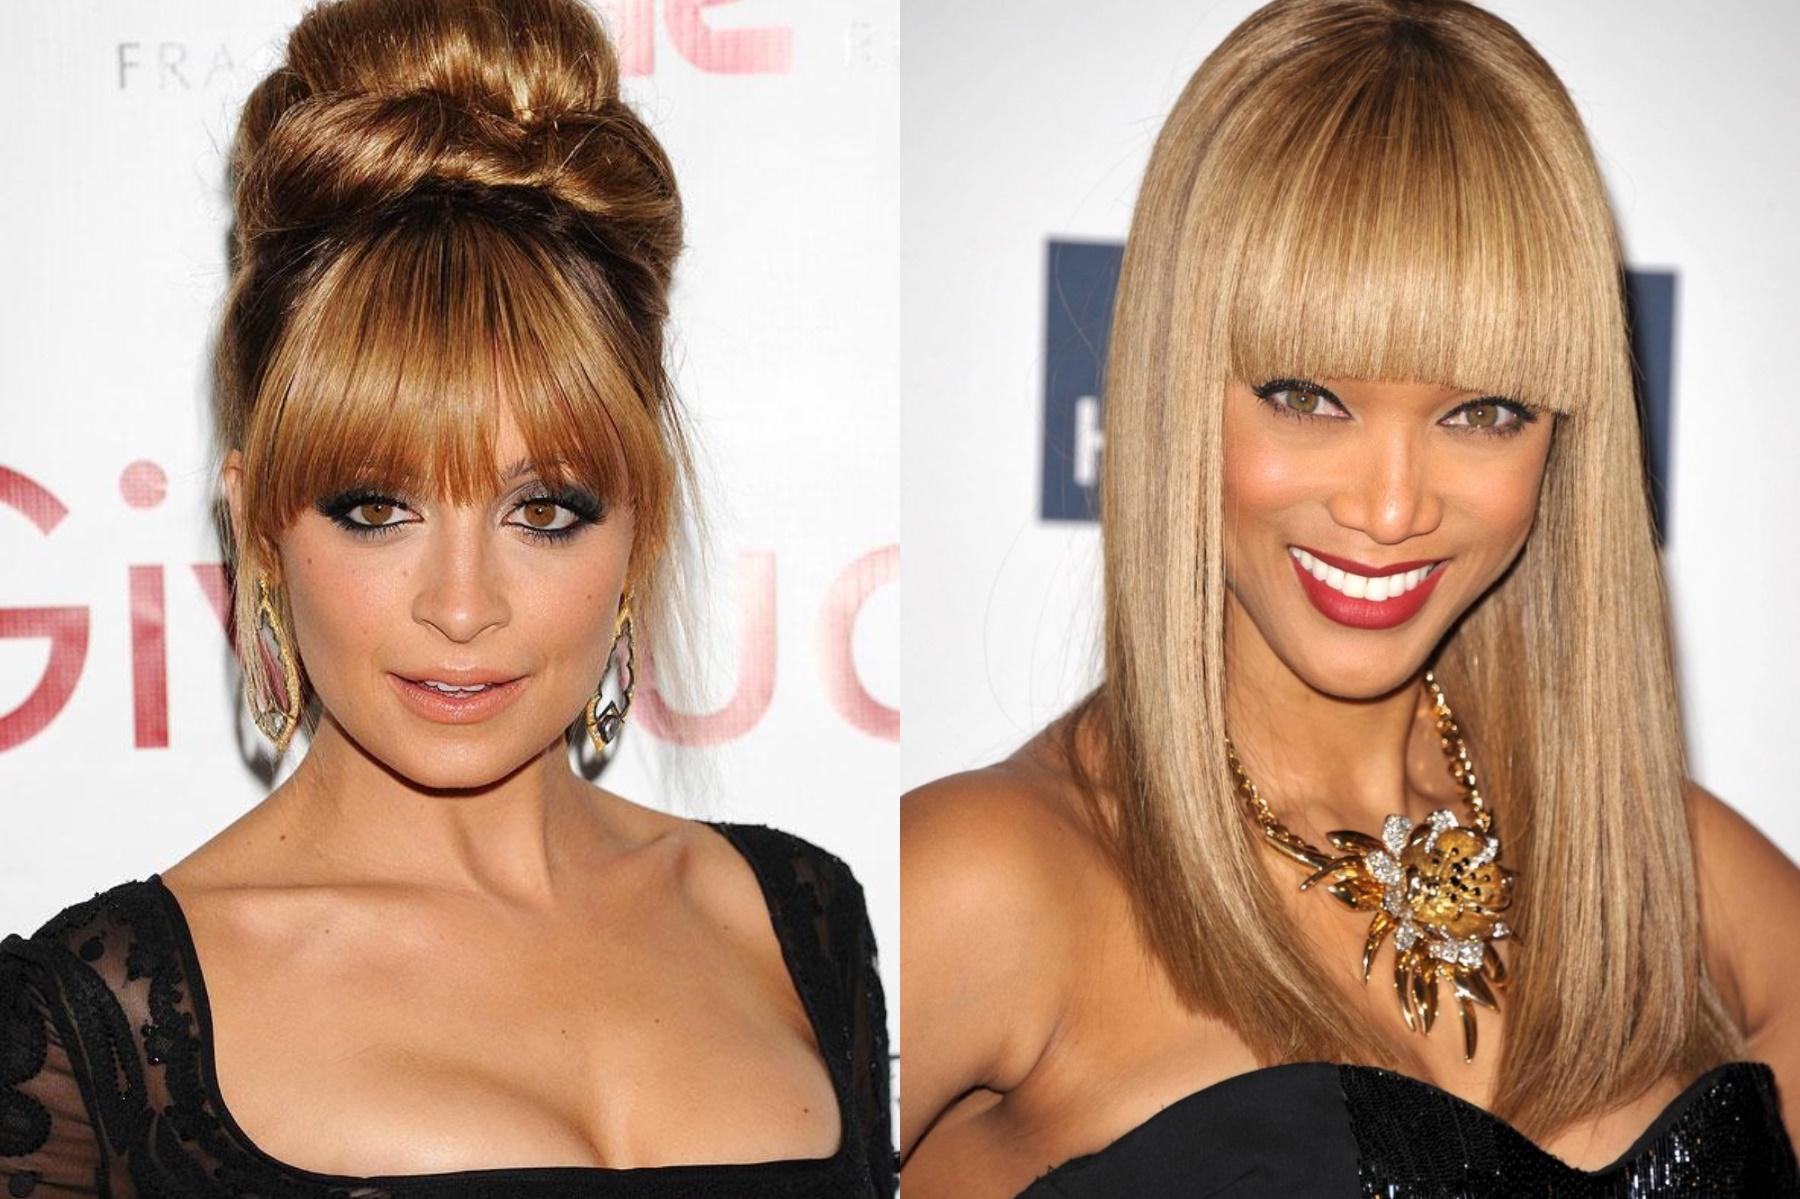 2018 Long Bangs Hairstyles For Women's - Haircuts Bangs 2